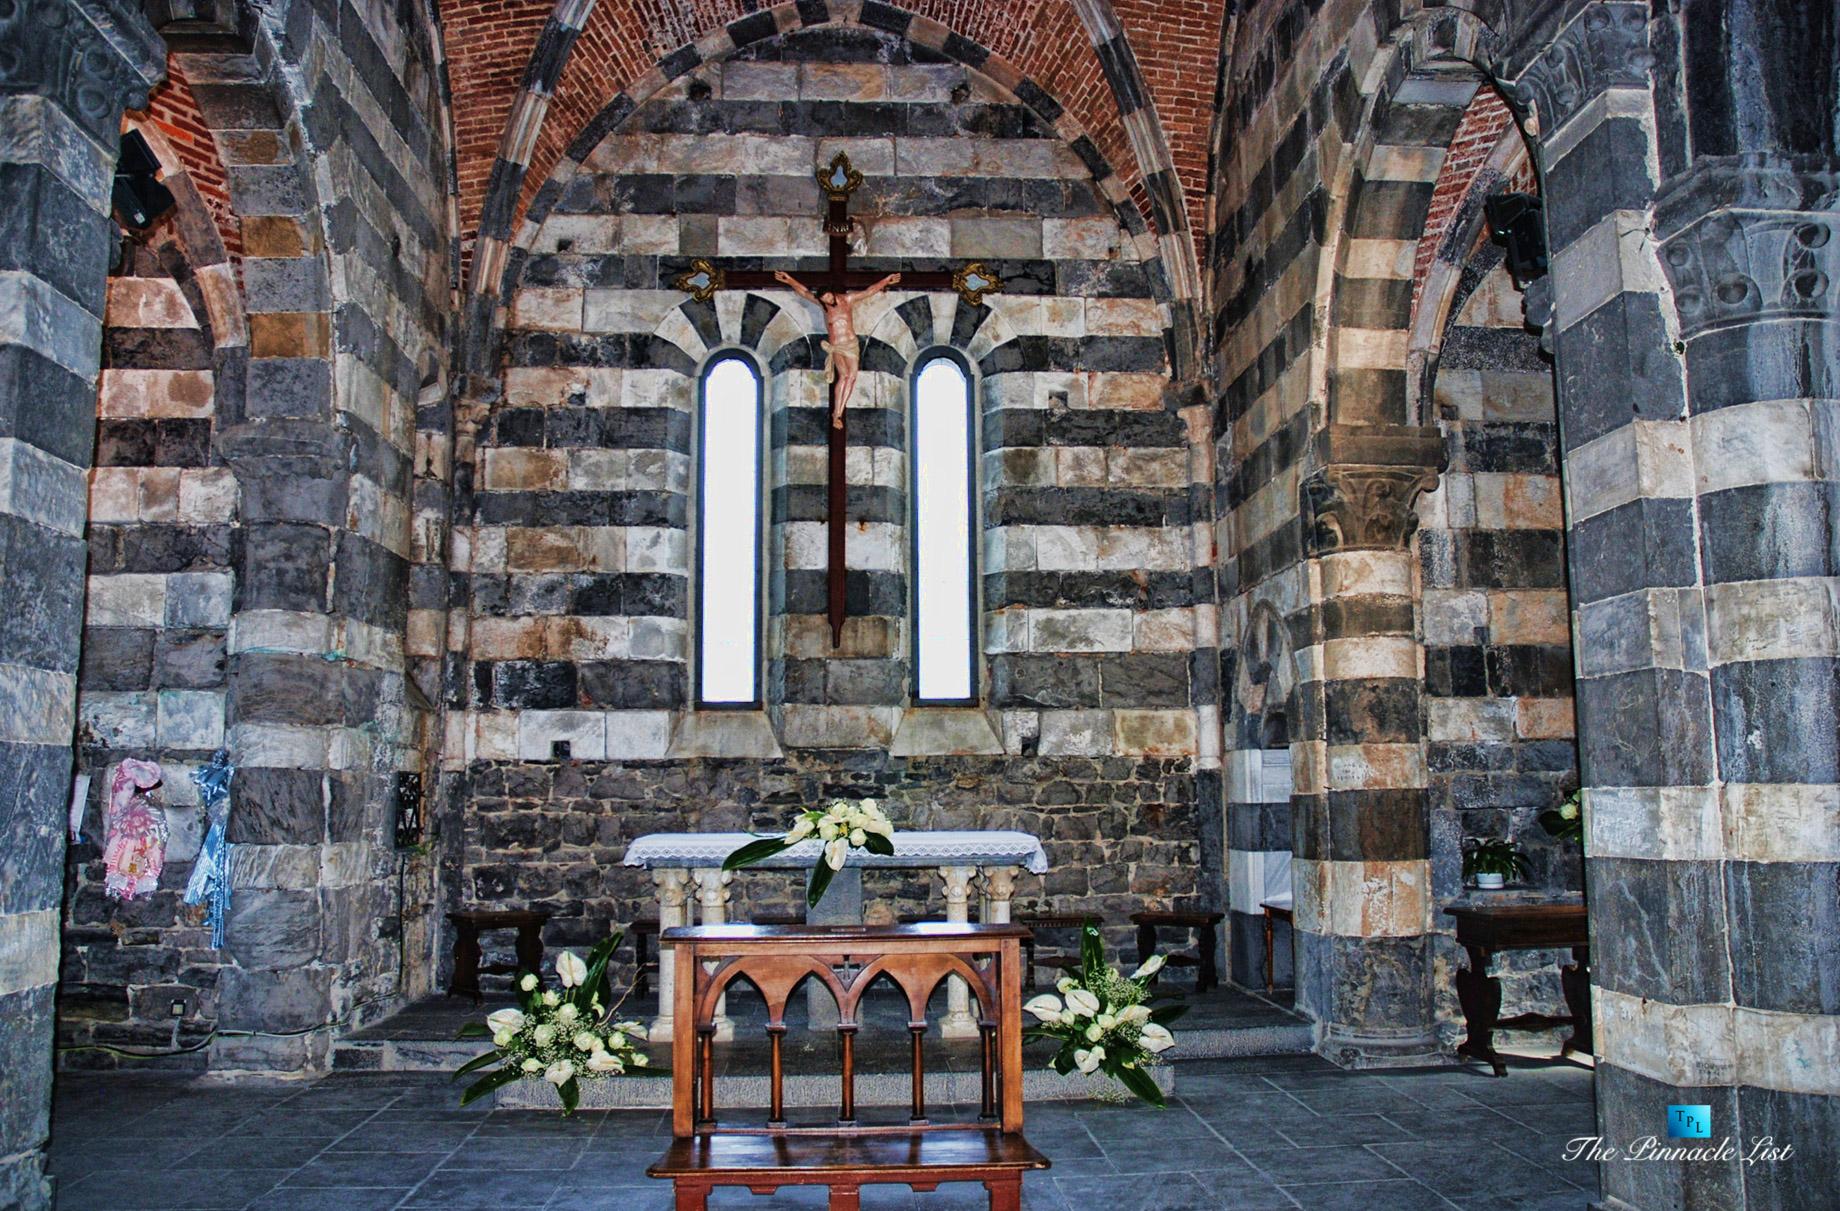 Gothic Church of St. Peter - Portovenere, La Spezia, Liguria - Italy's Hidden Treasure